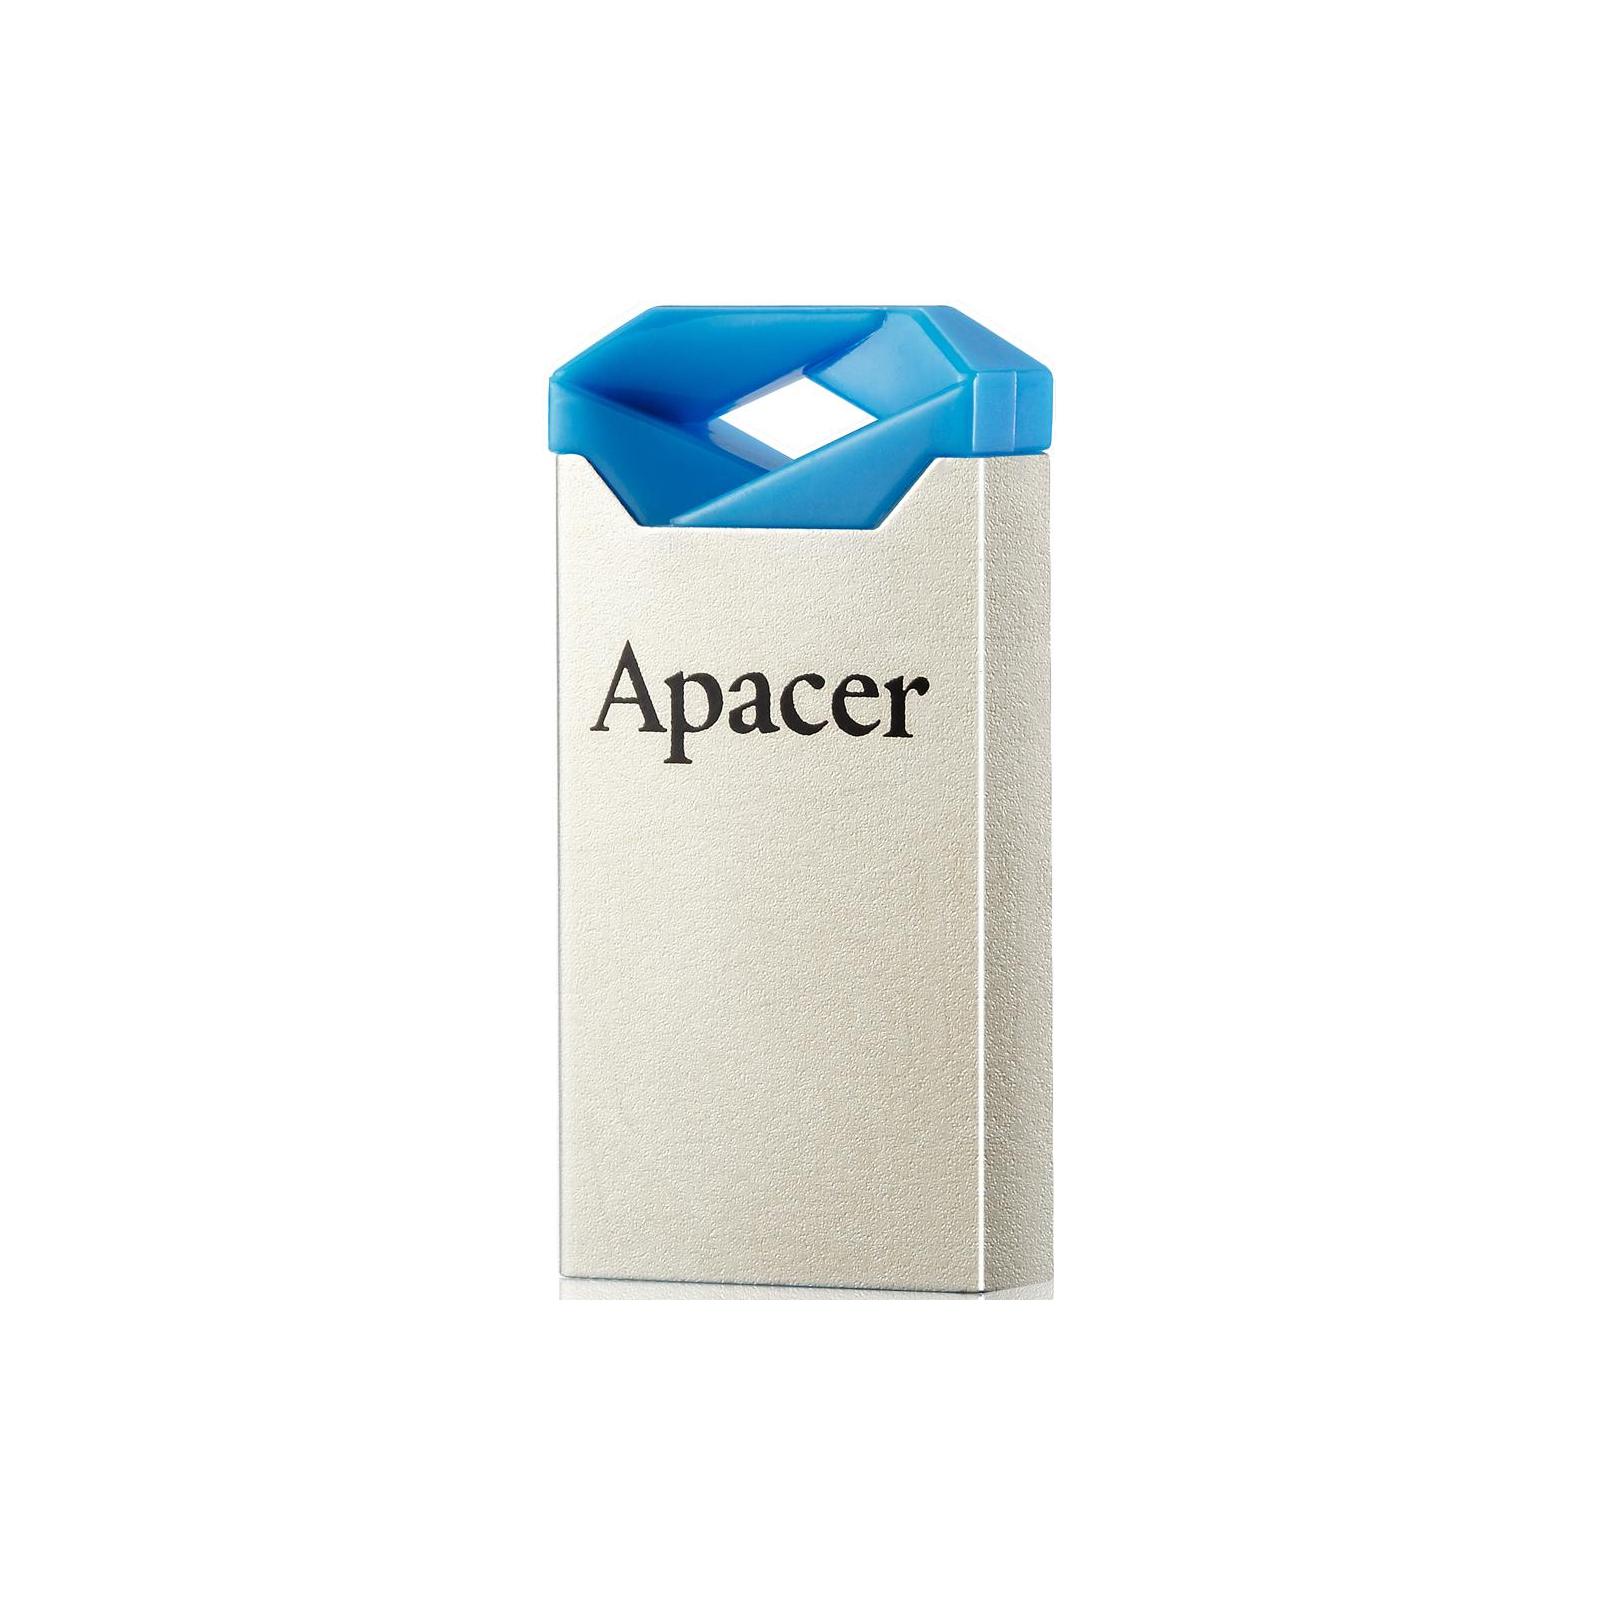 USB флеш накопитель Apacer 64GB AH111 Blue USB 2.0 (AP64GAH111U-1)